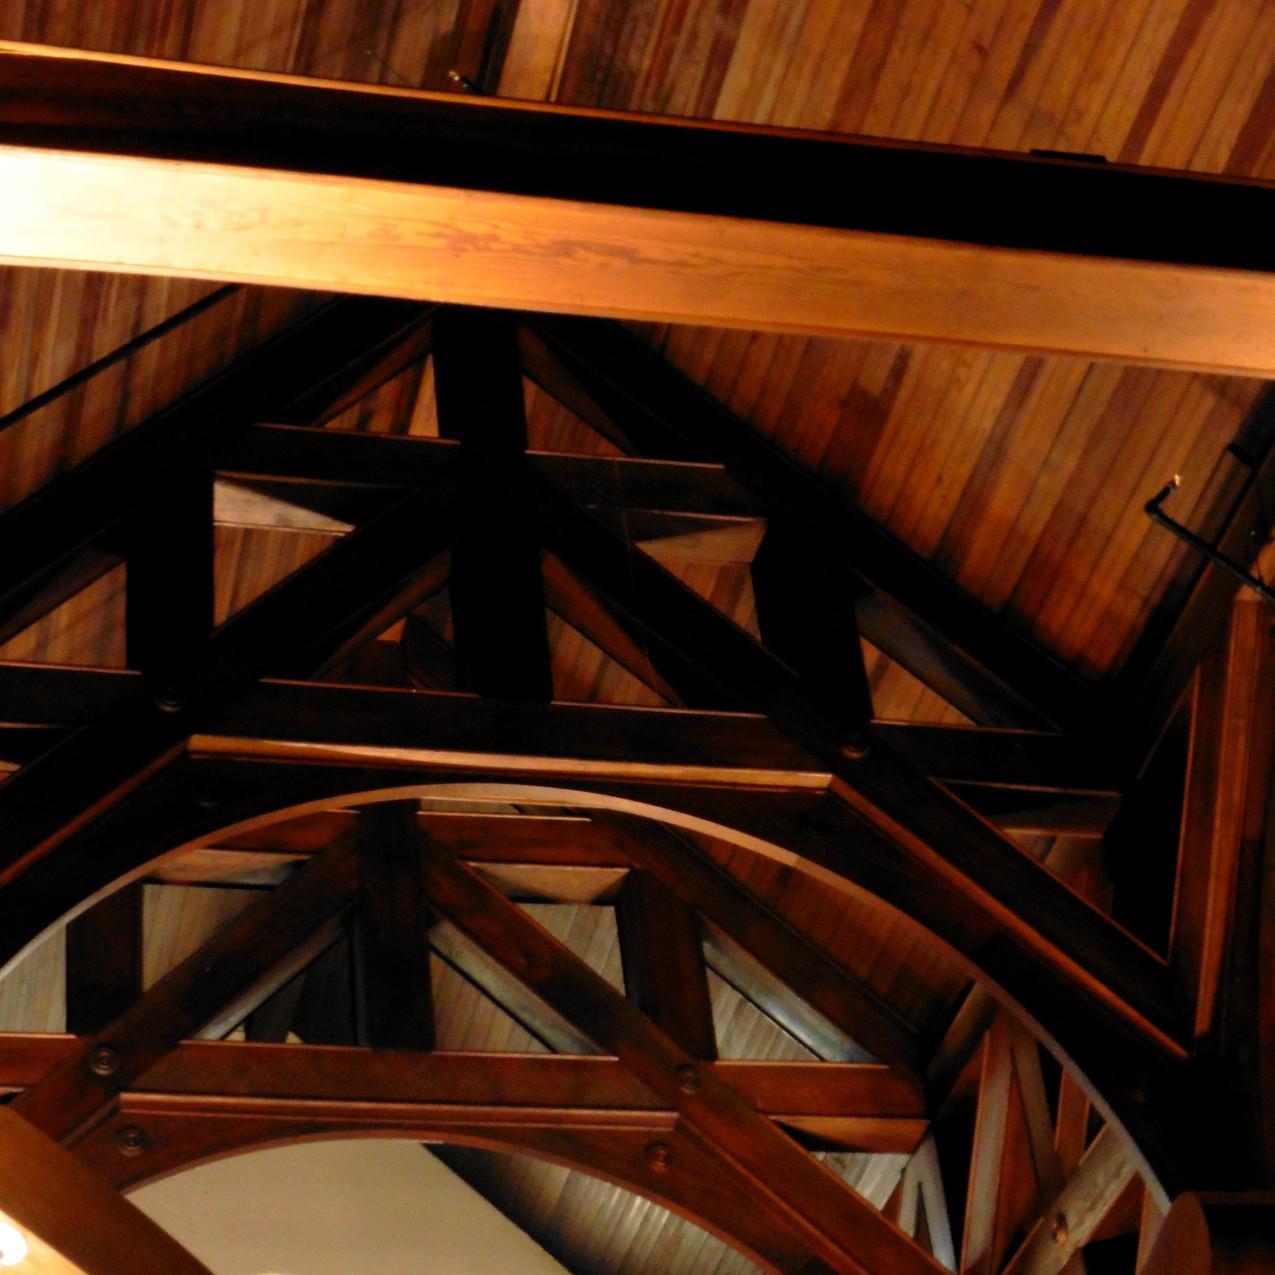 Obed & Isaac's Peoria interior ceiling 0317